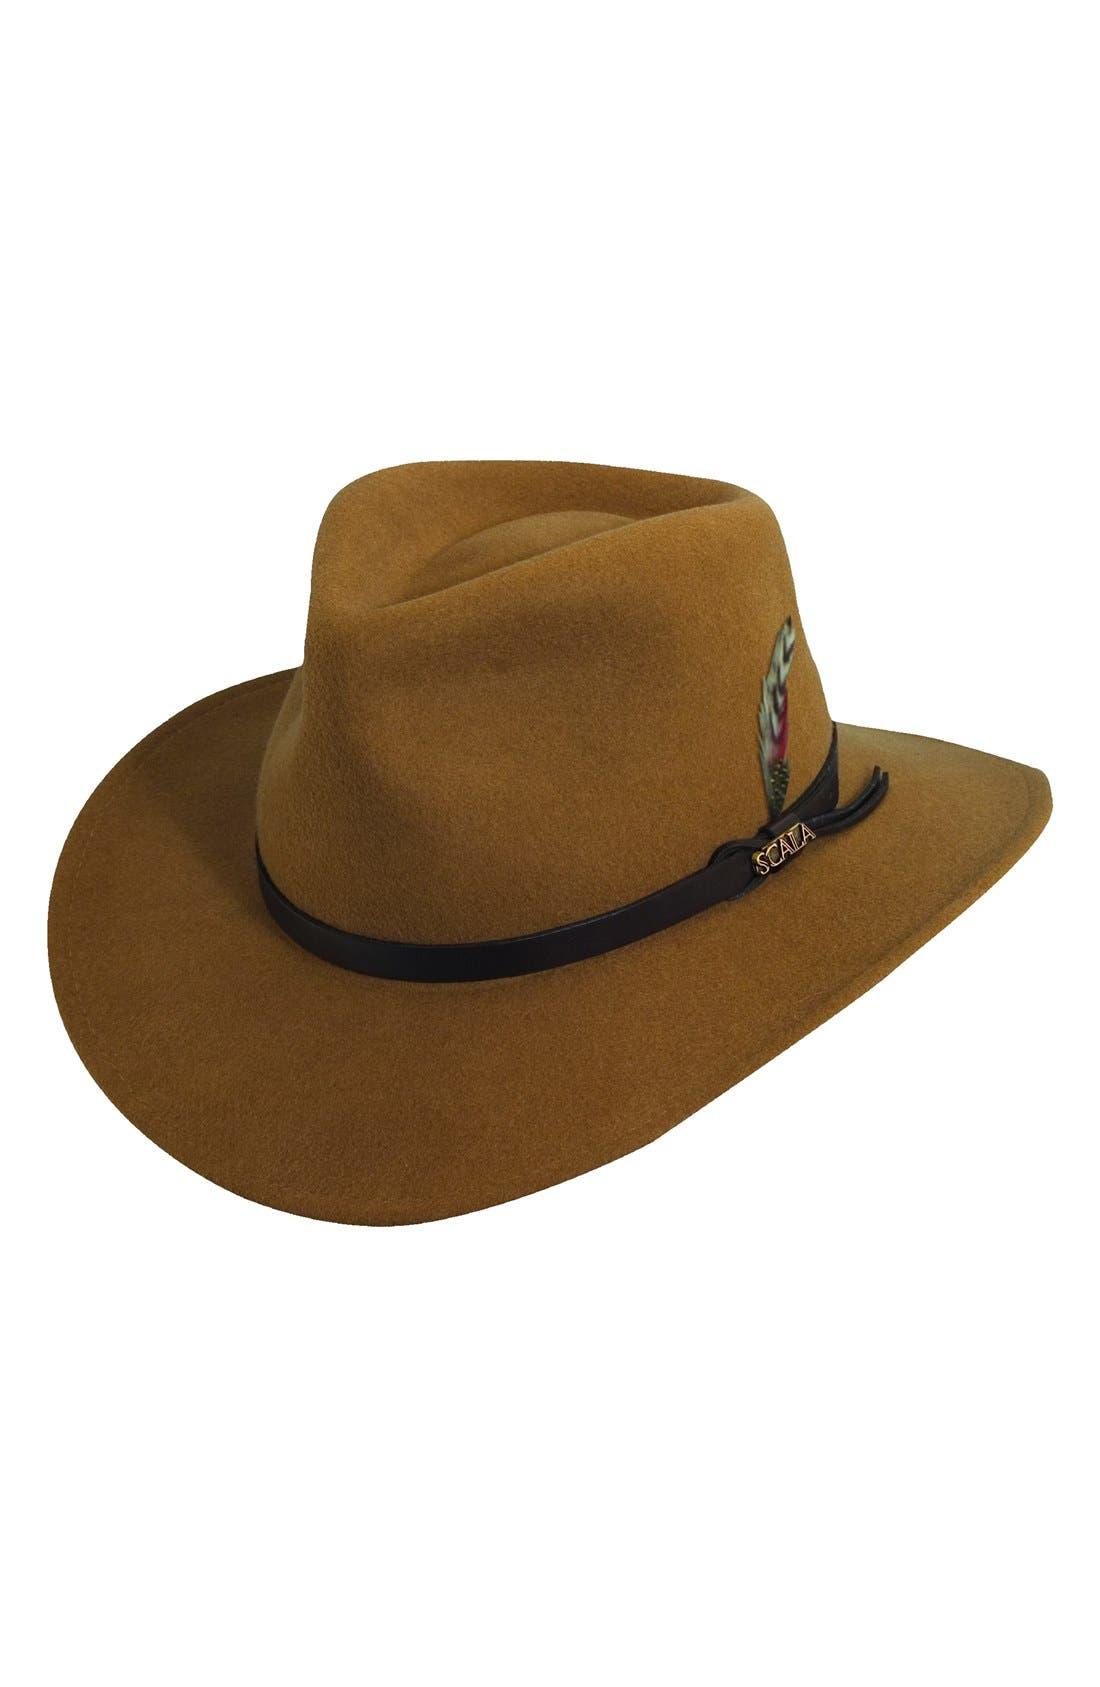 Alternate Image 1 Selected - Scala 'Classico' Crushable Felt Outback Hat